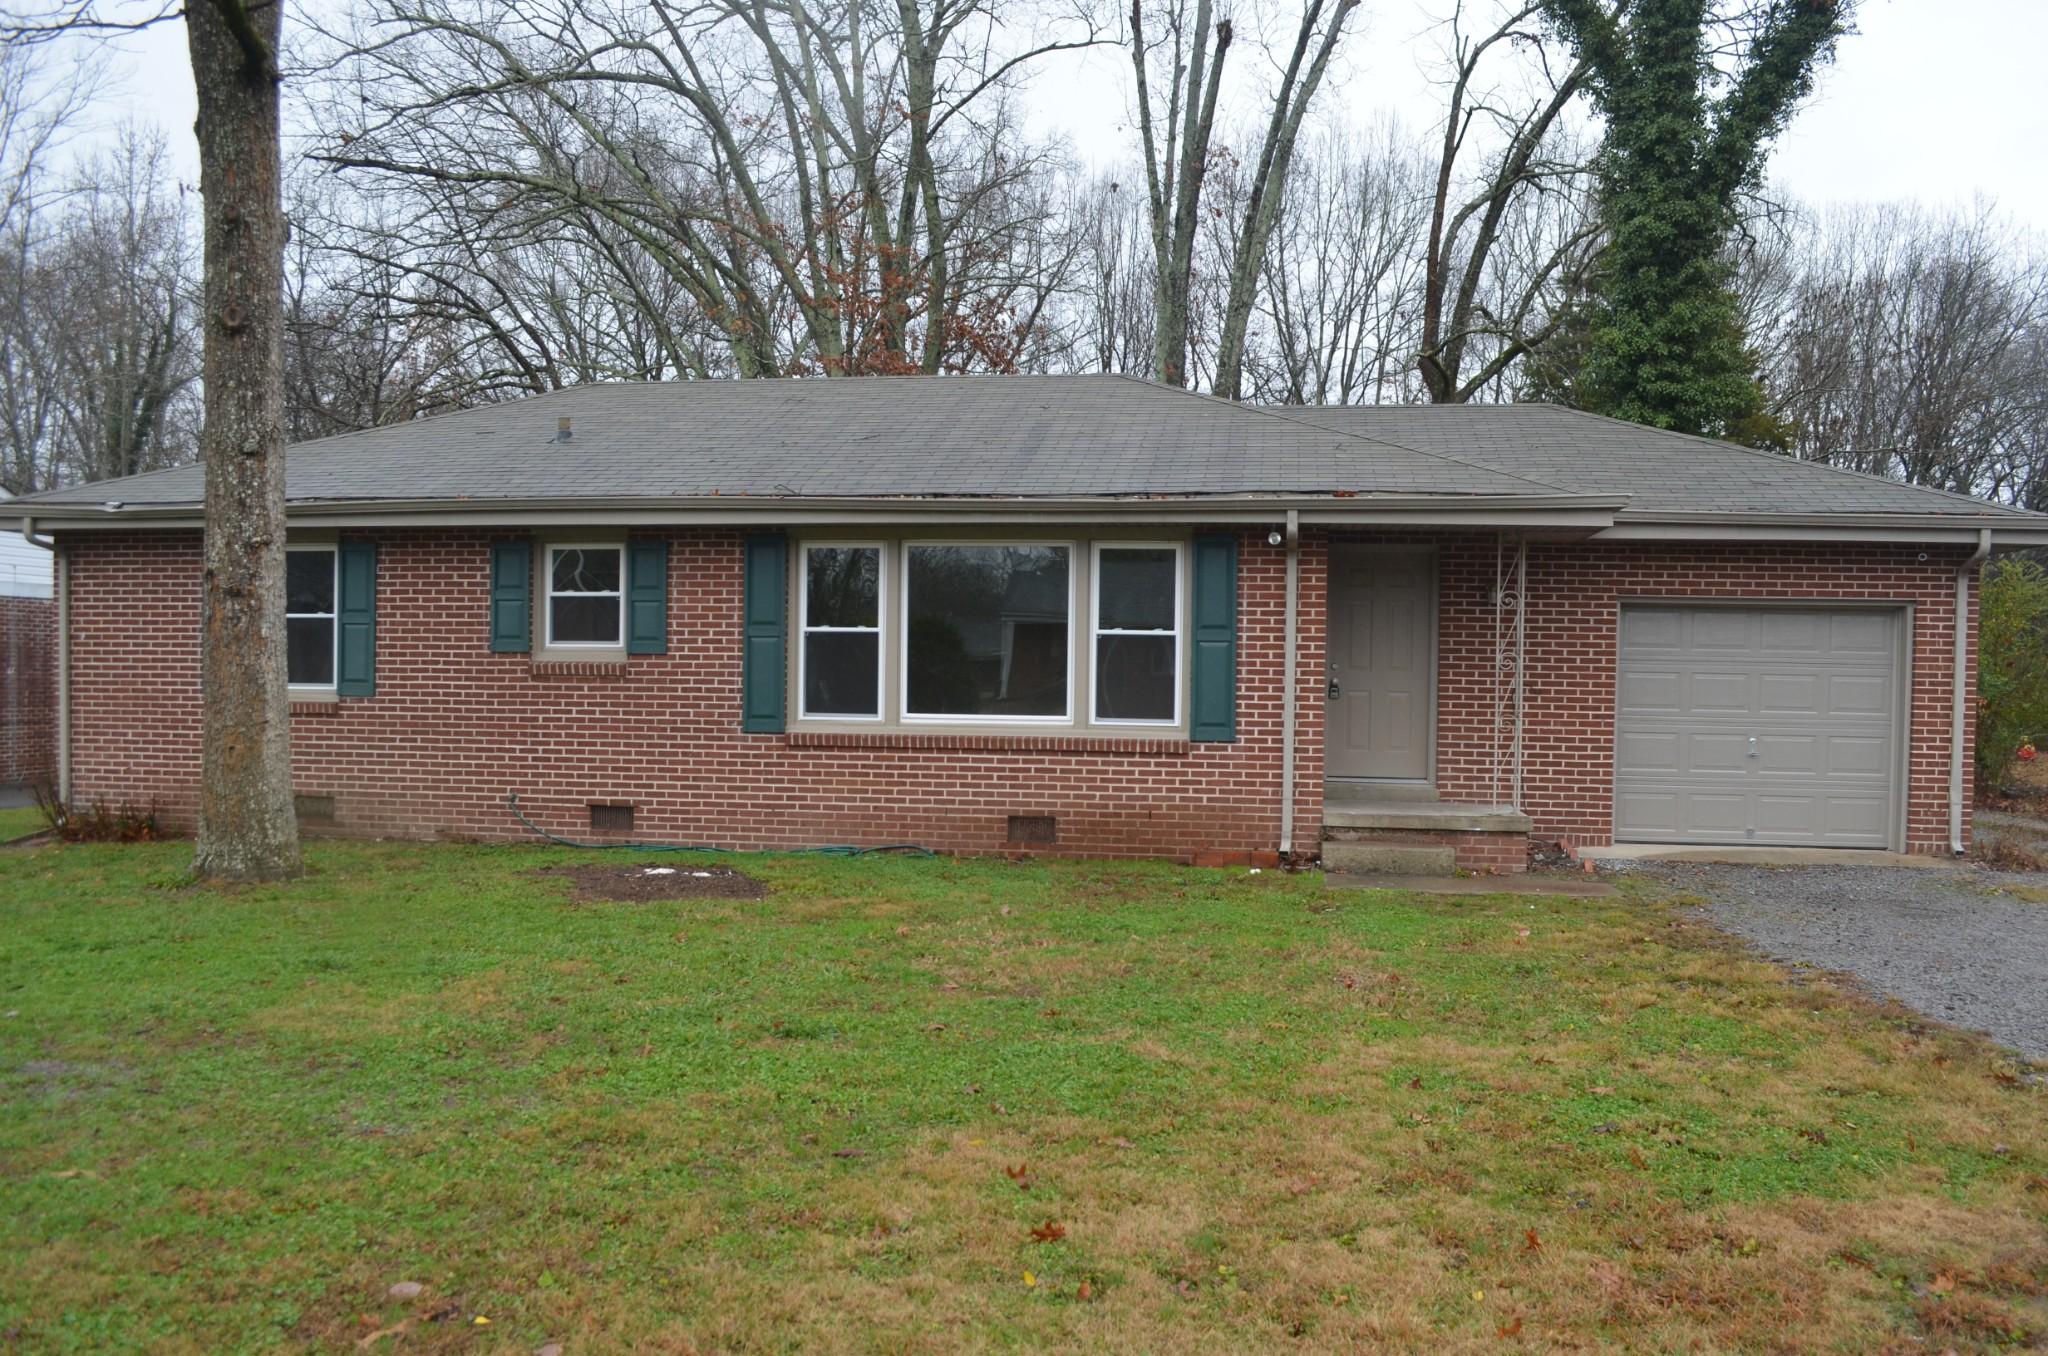 508 & 508 1/2 Cumberland Ave, Tullahoma, TN 37388 - Tullahoma, TN real estate listing